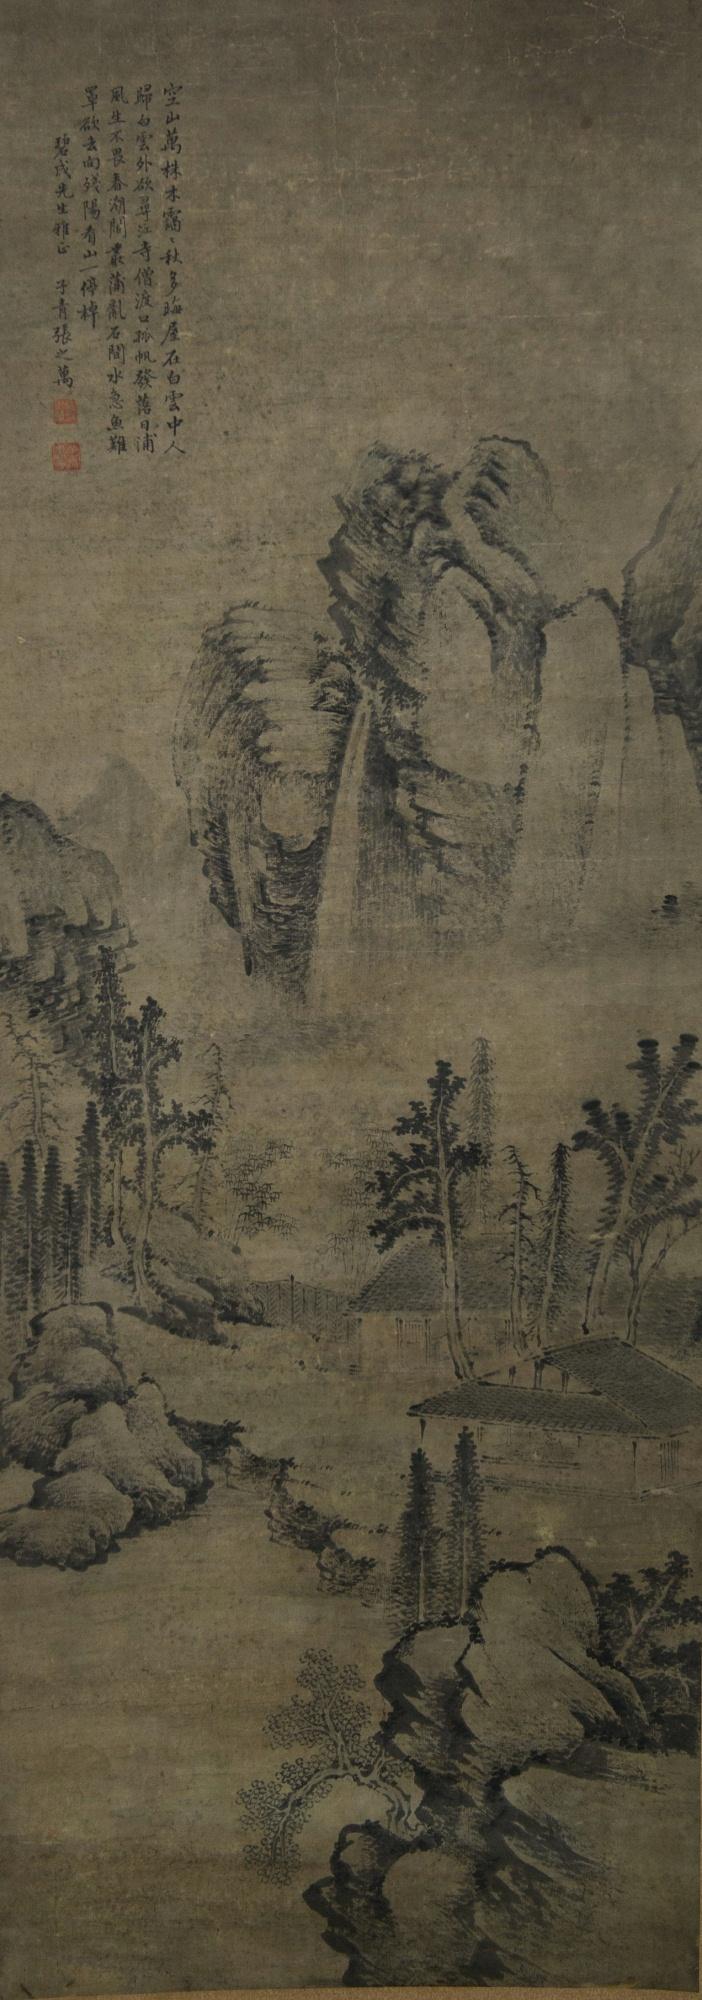 Chinese Landscape Painting Signed Zhang Zhi Yuan